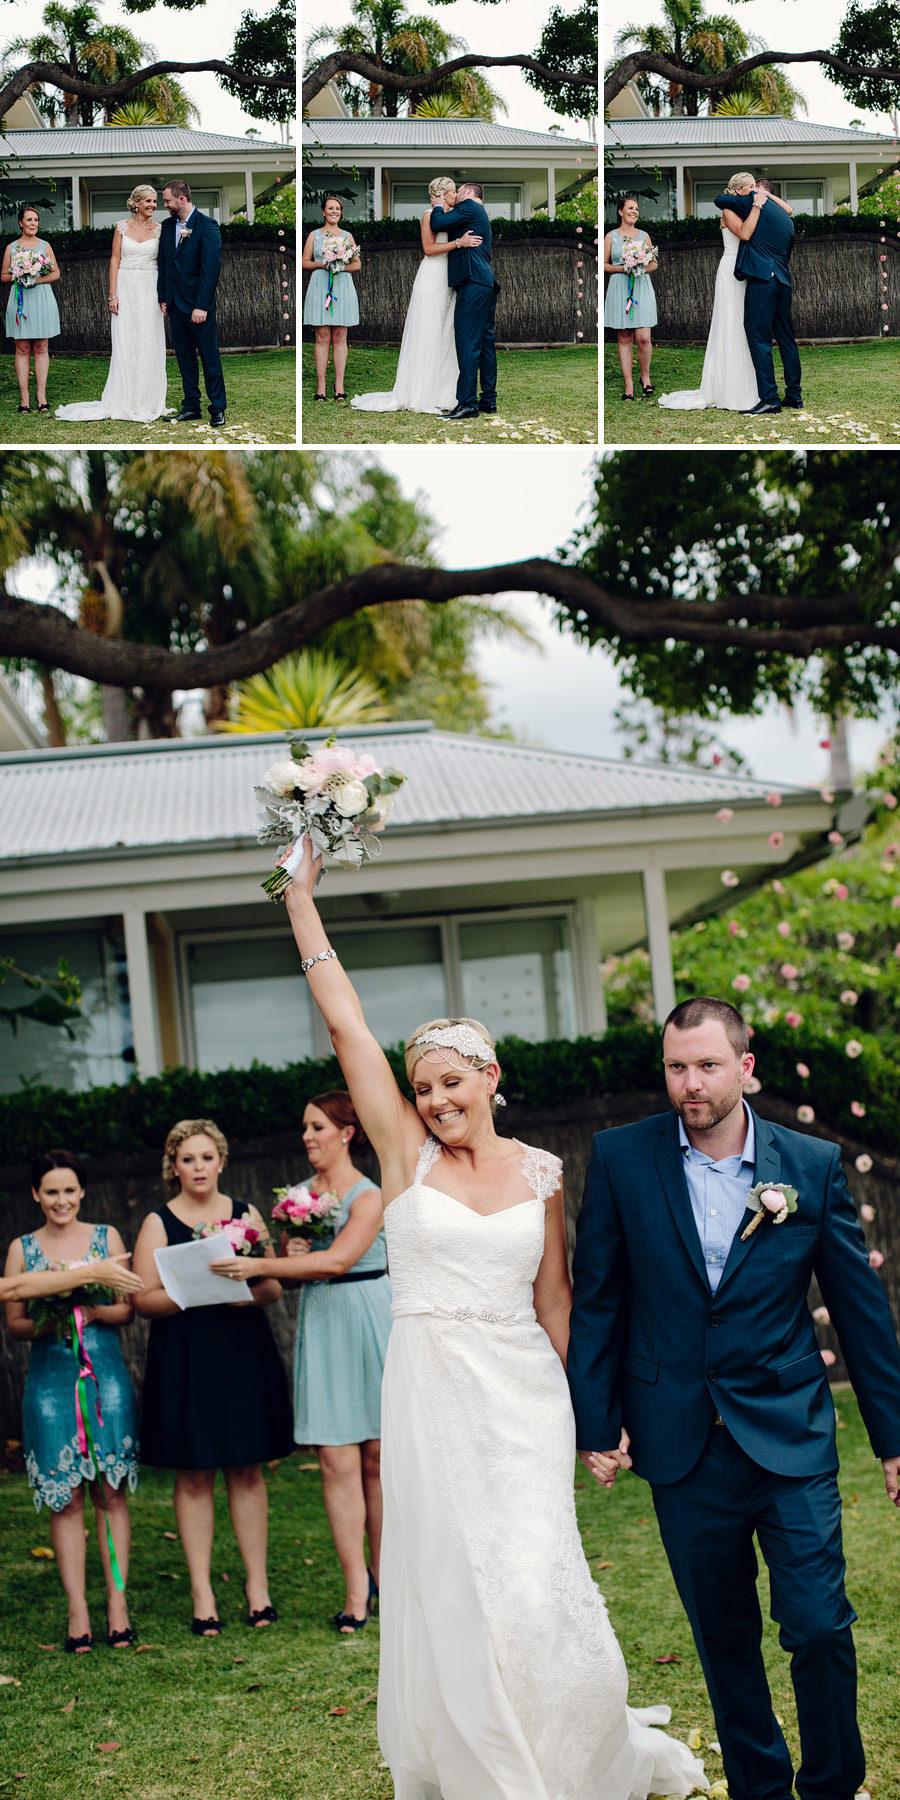 Sydney Wedding Photography: Ceremony